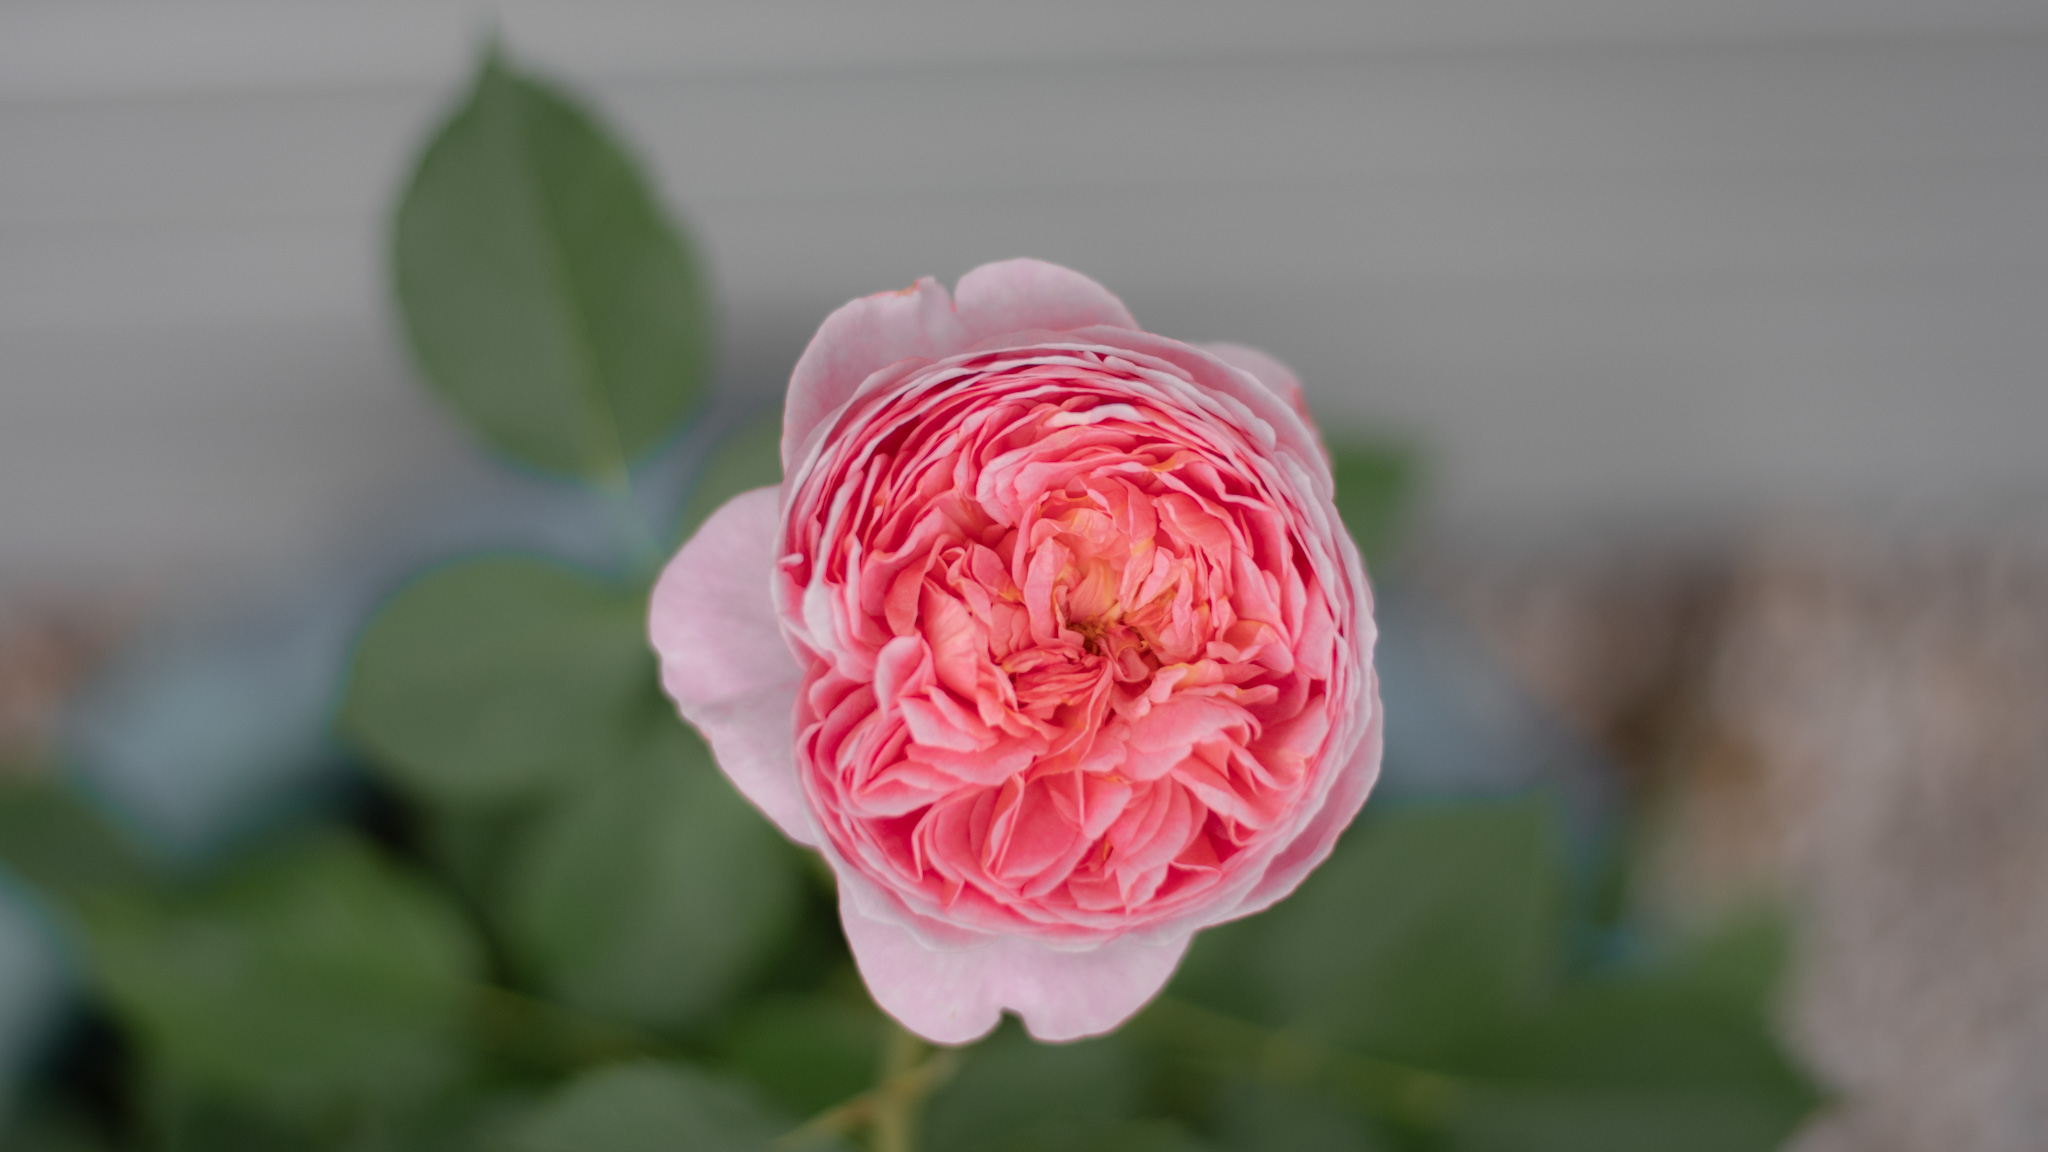 Boscobel rose